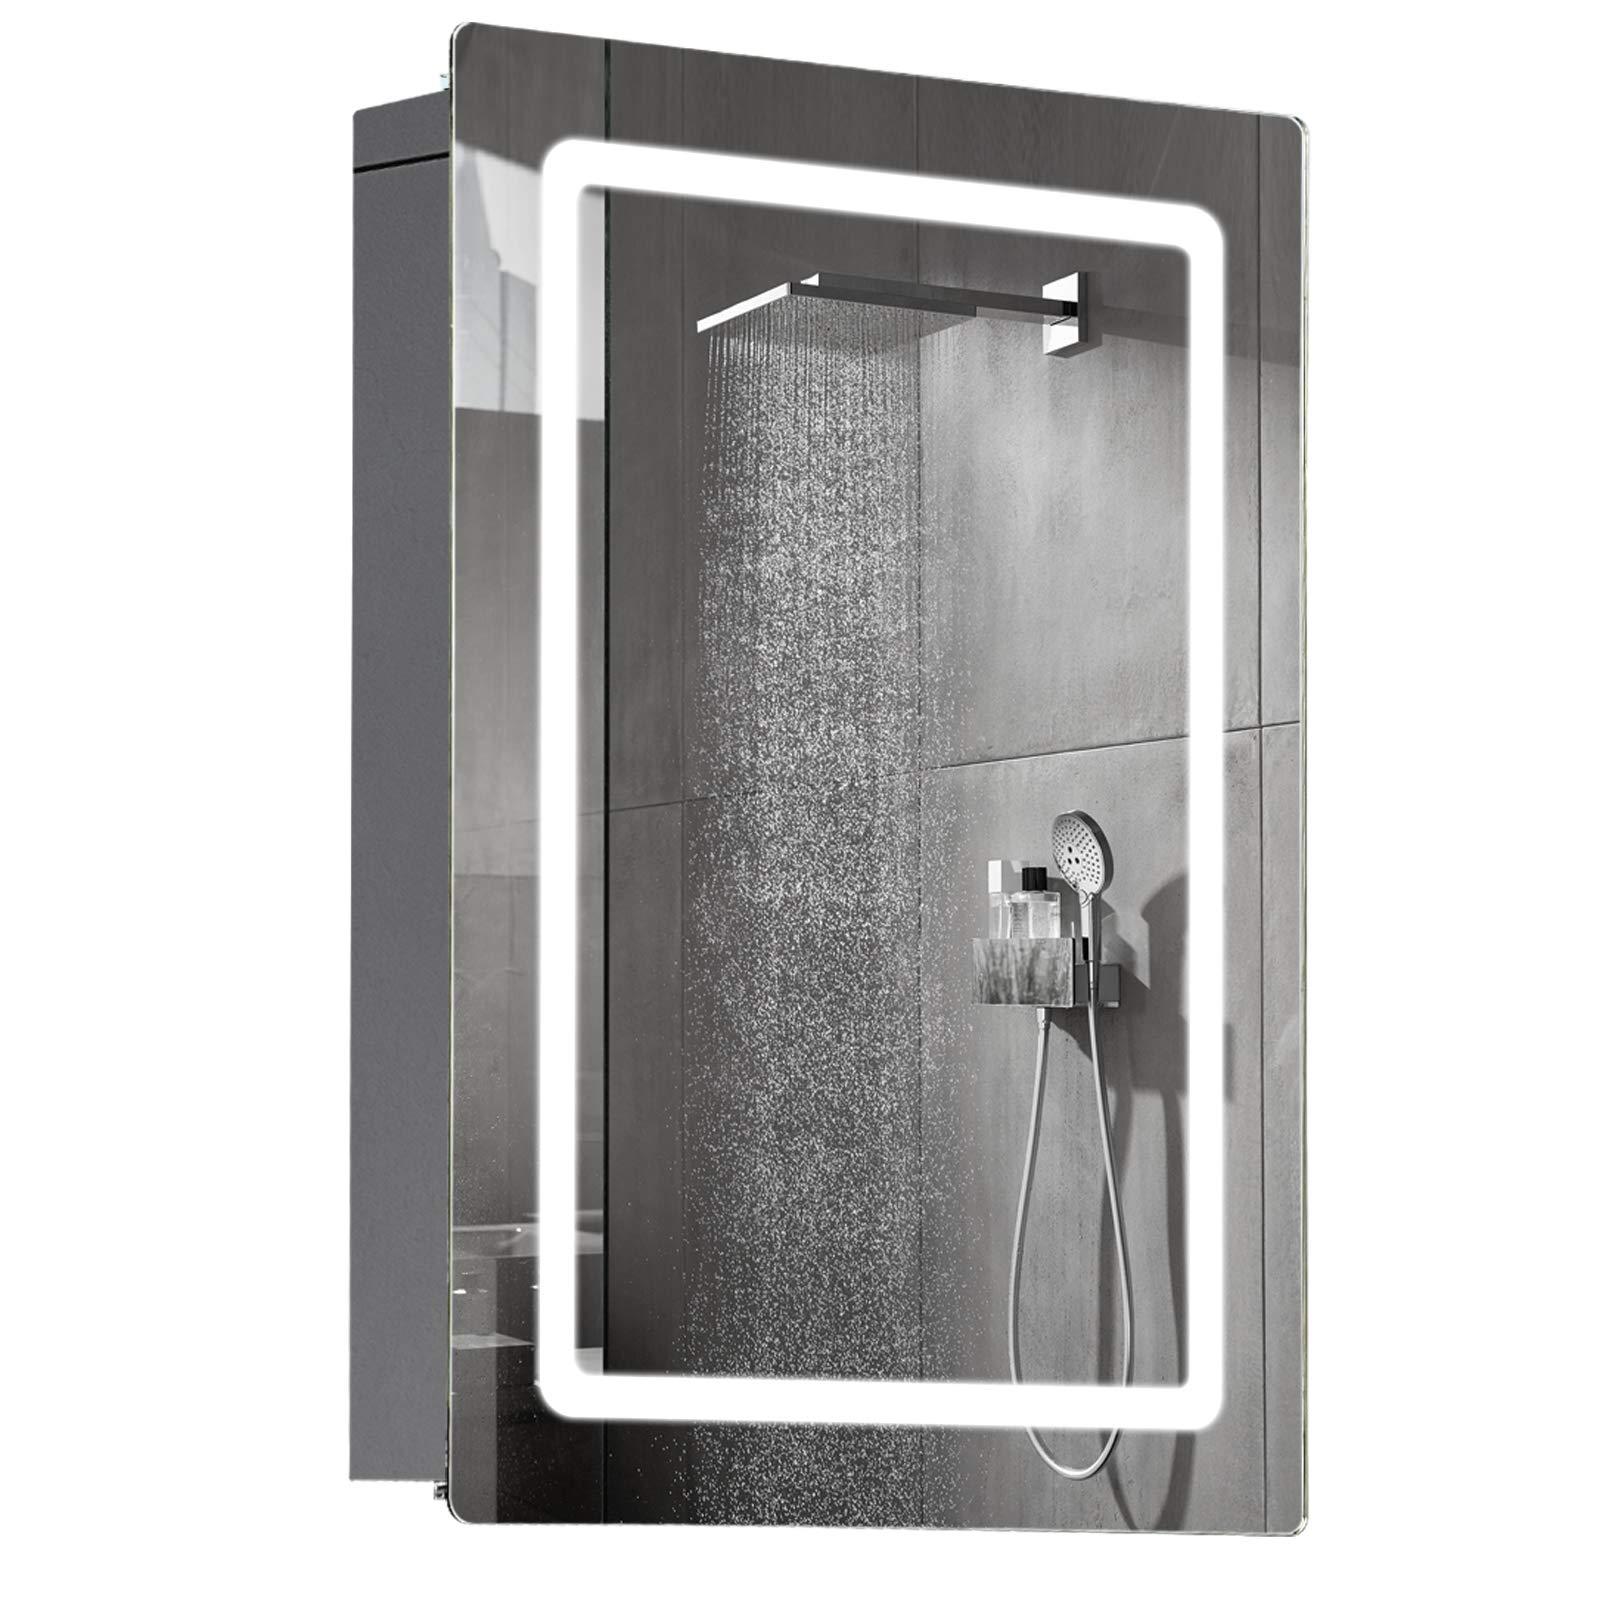 "HOMCOM LED Wall Mount Bathroom Vanity Make Up Mirror w/Defogger - 36"" x 28"""